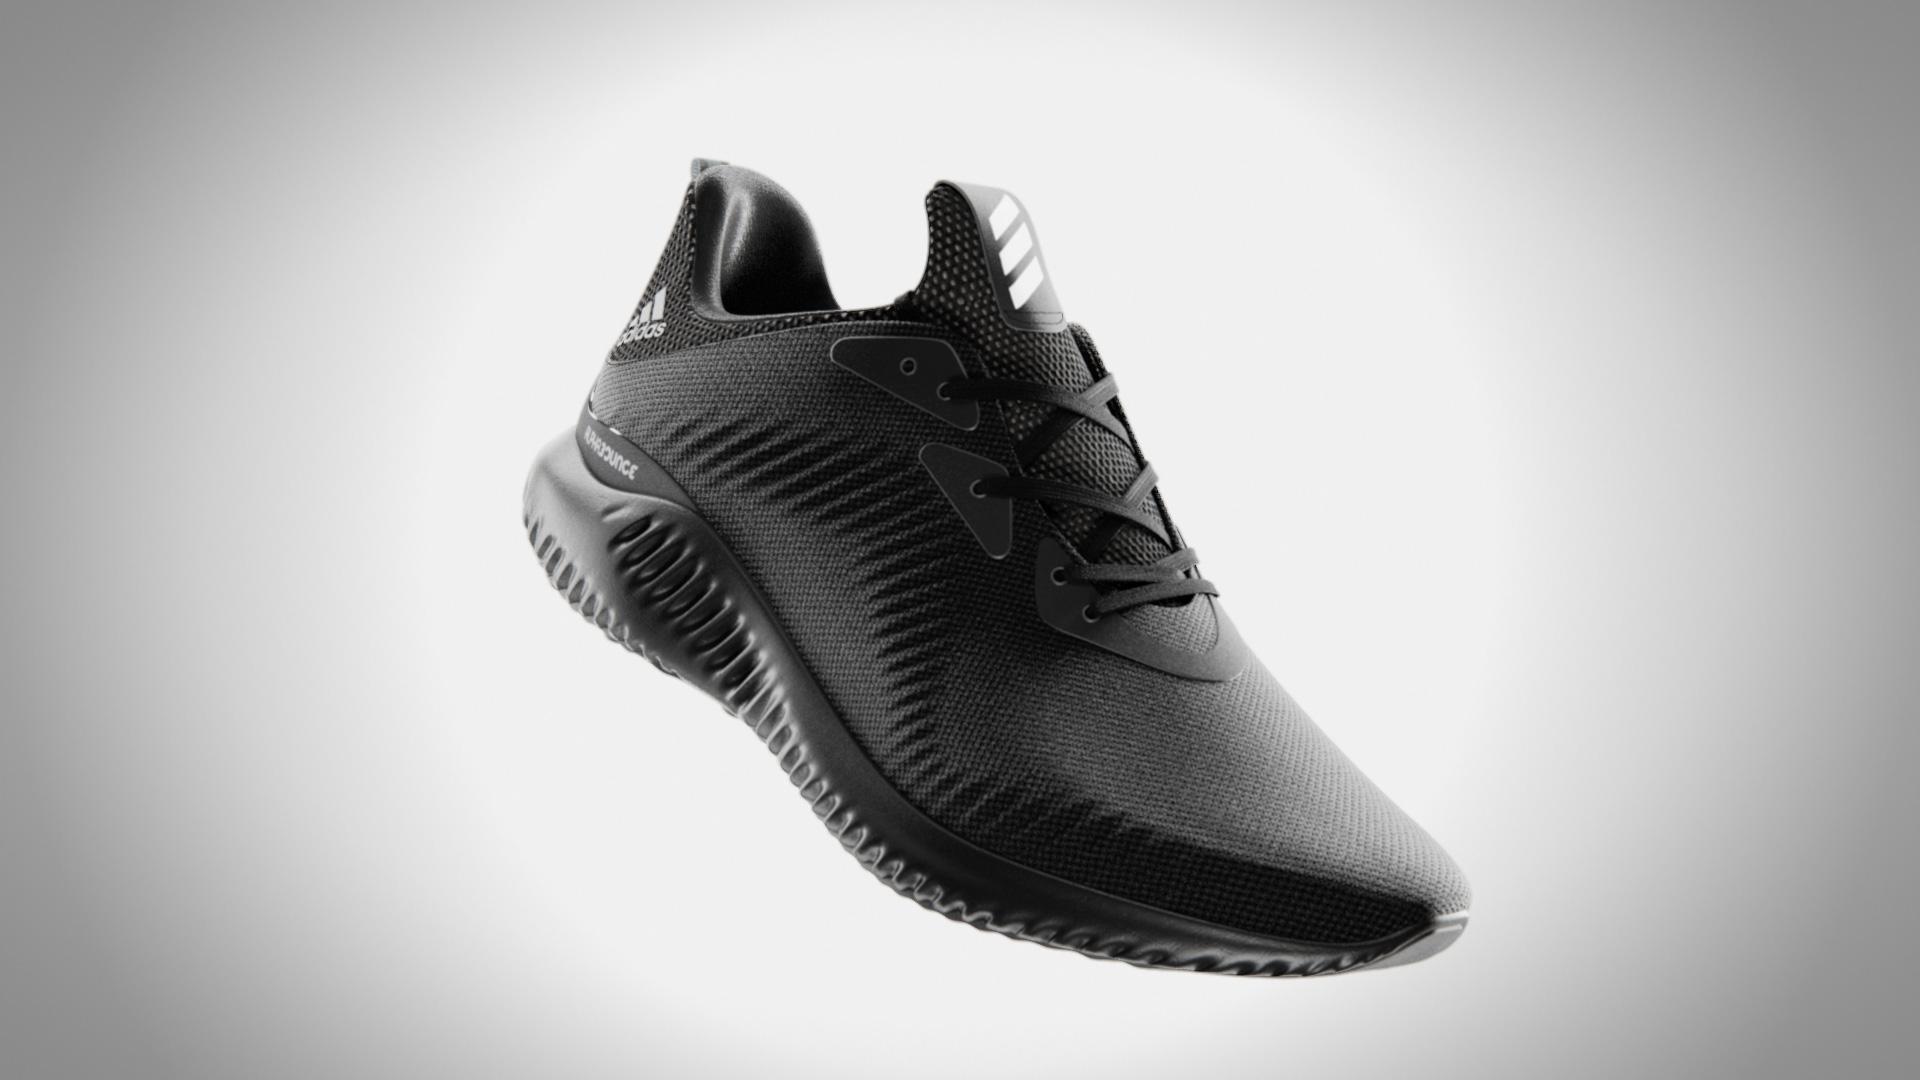 image of black adidas alphabounce shoe